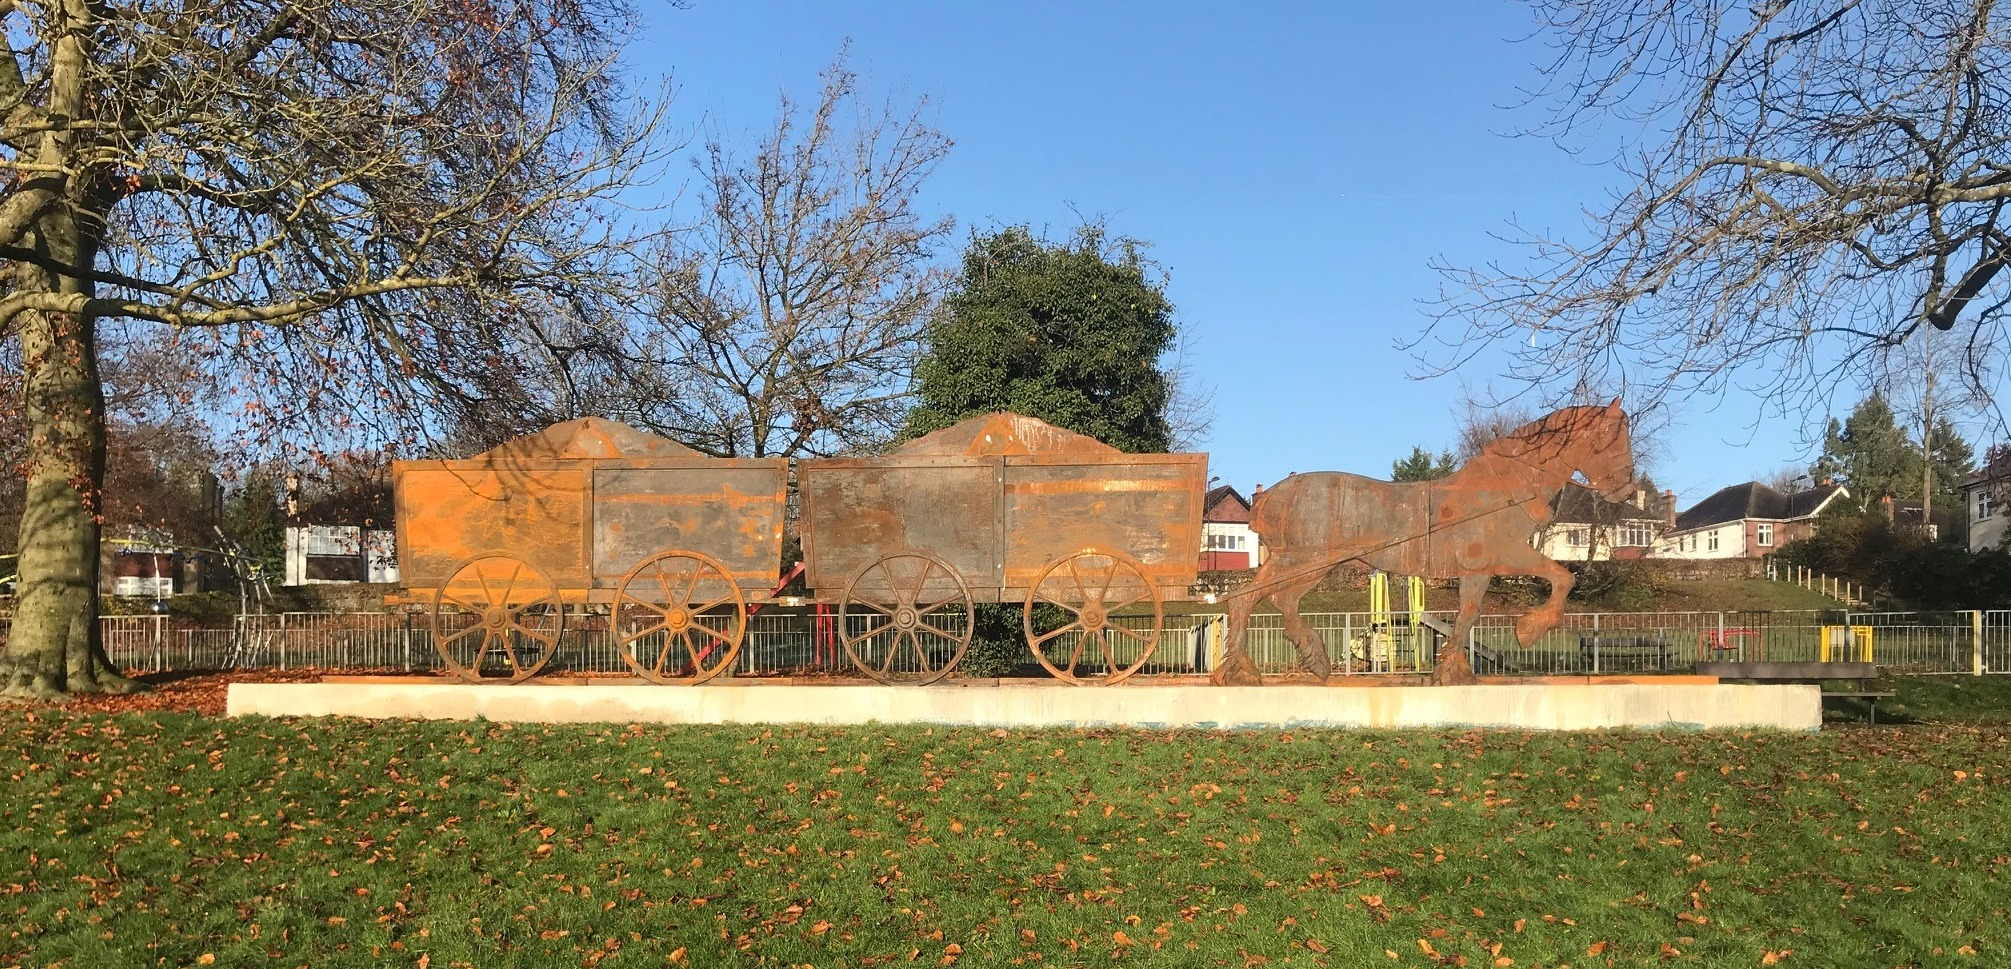 New Iron Horse art sculpture celebrates Purley's rail heritage